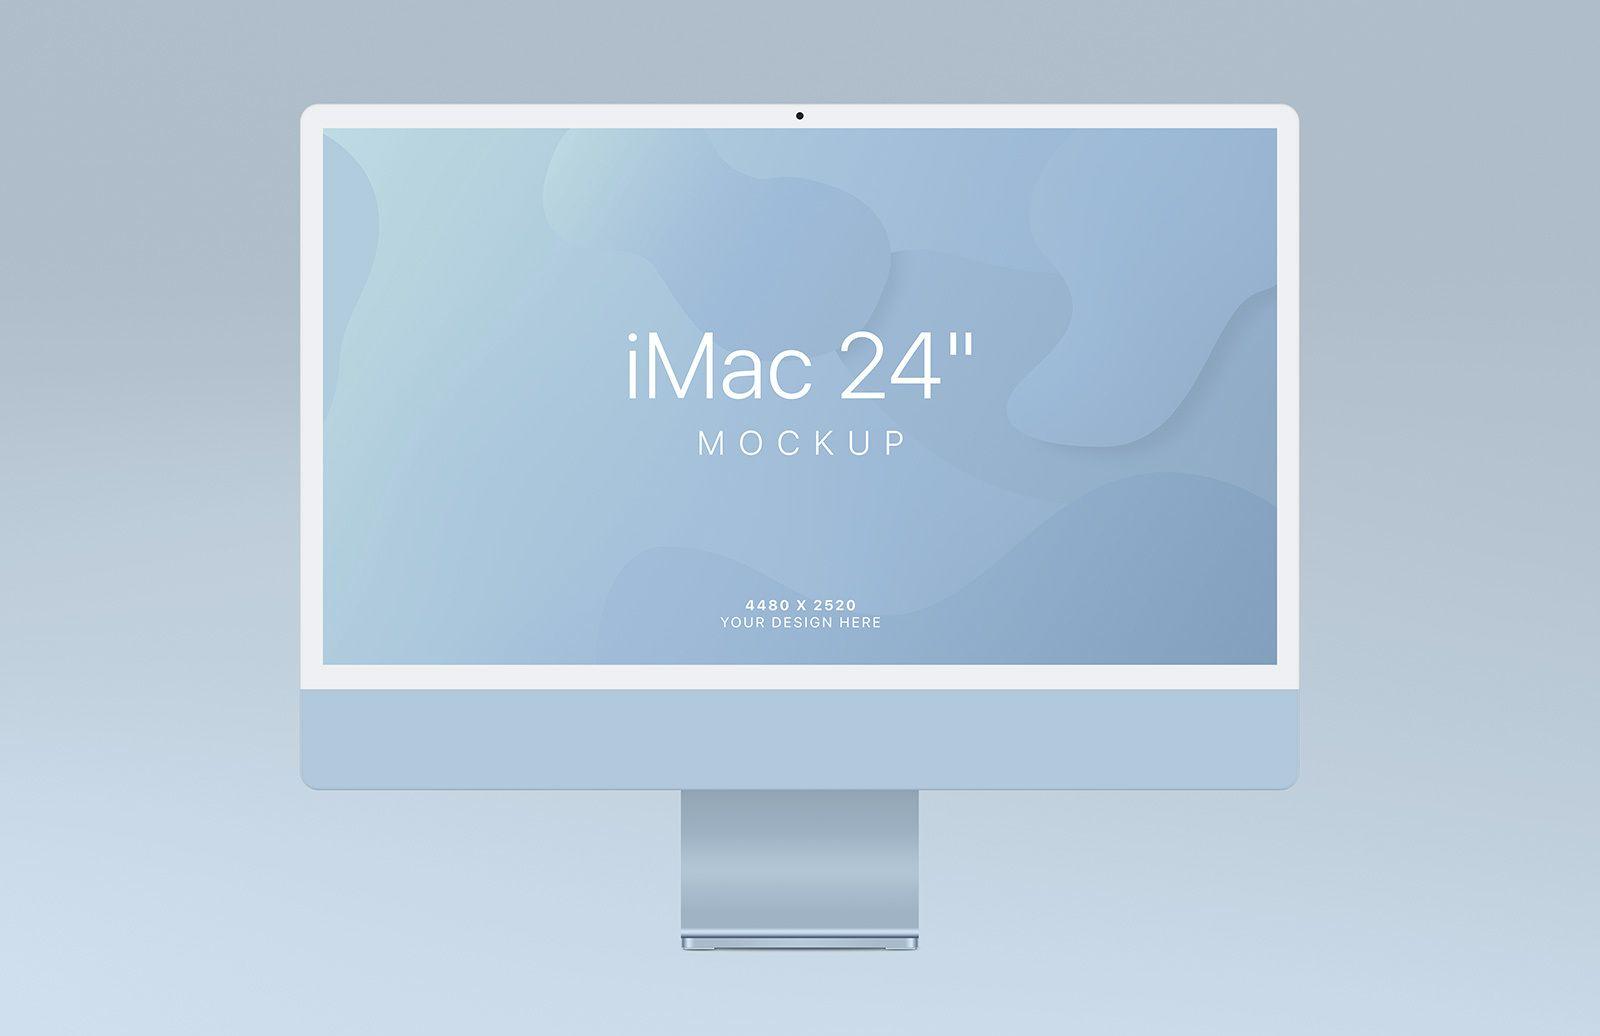 I Mac 2021 Mockup Preview 1